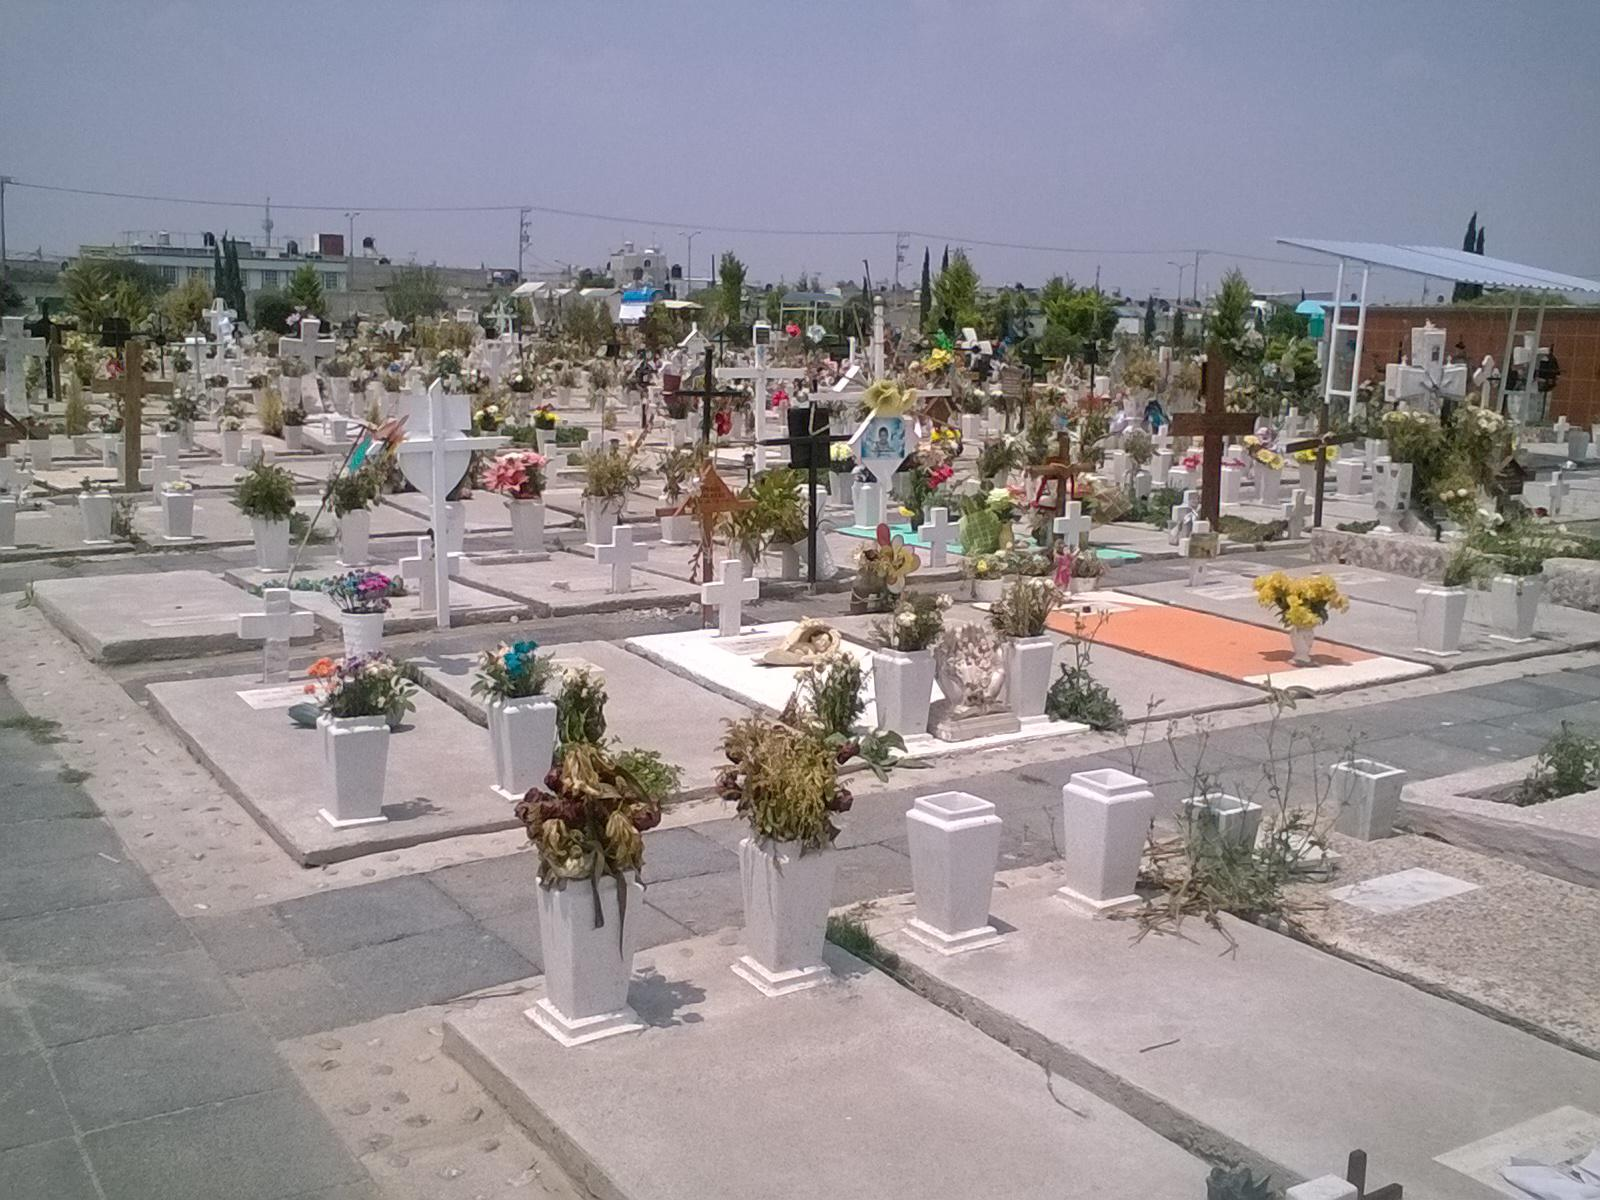 lote 4 servicios funerarios jard n guadalupano cd azteca